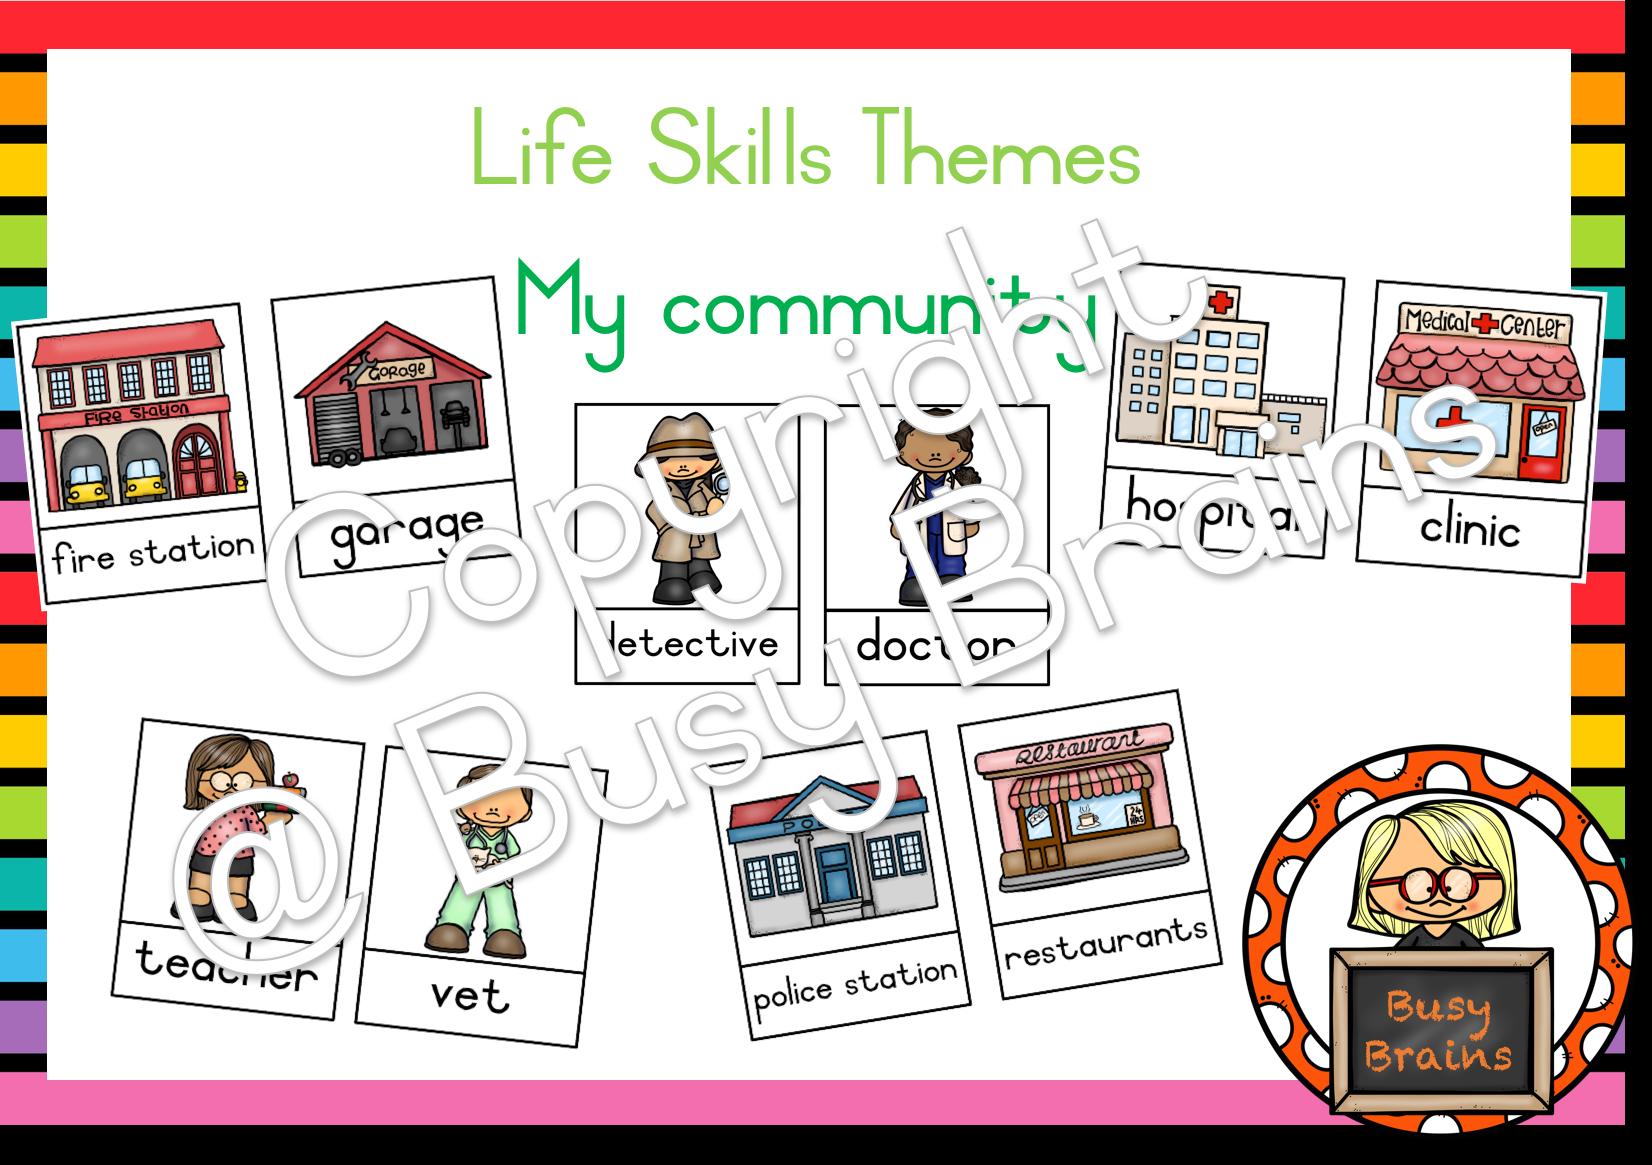 Life Skills Themes.